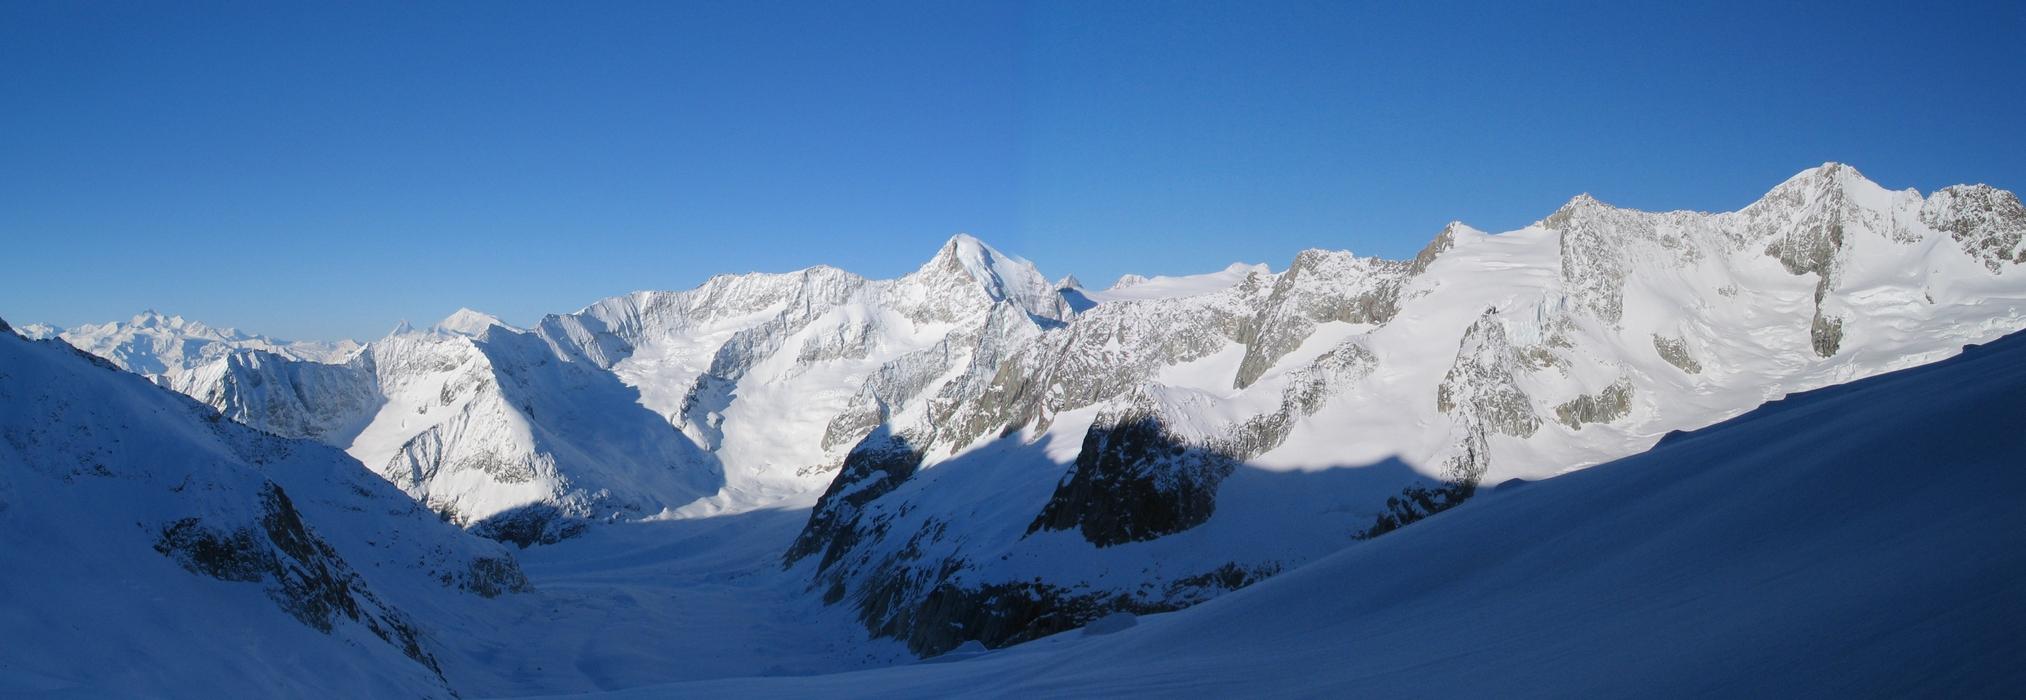 Grosser Aletschhorn Berner Alpen / Alpes bernoises Switzerland panorama 08